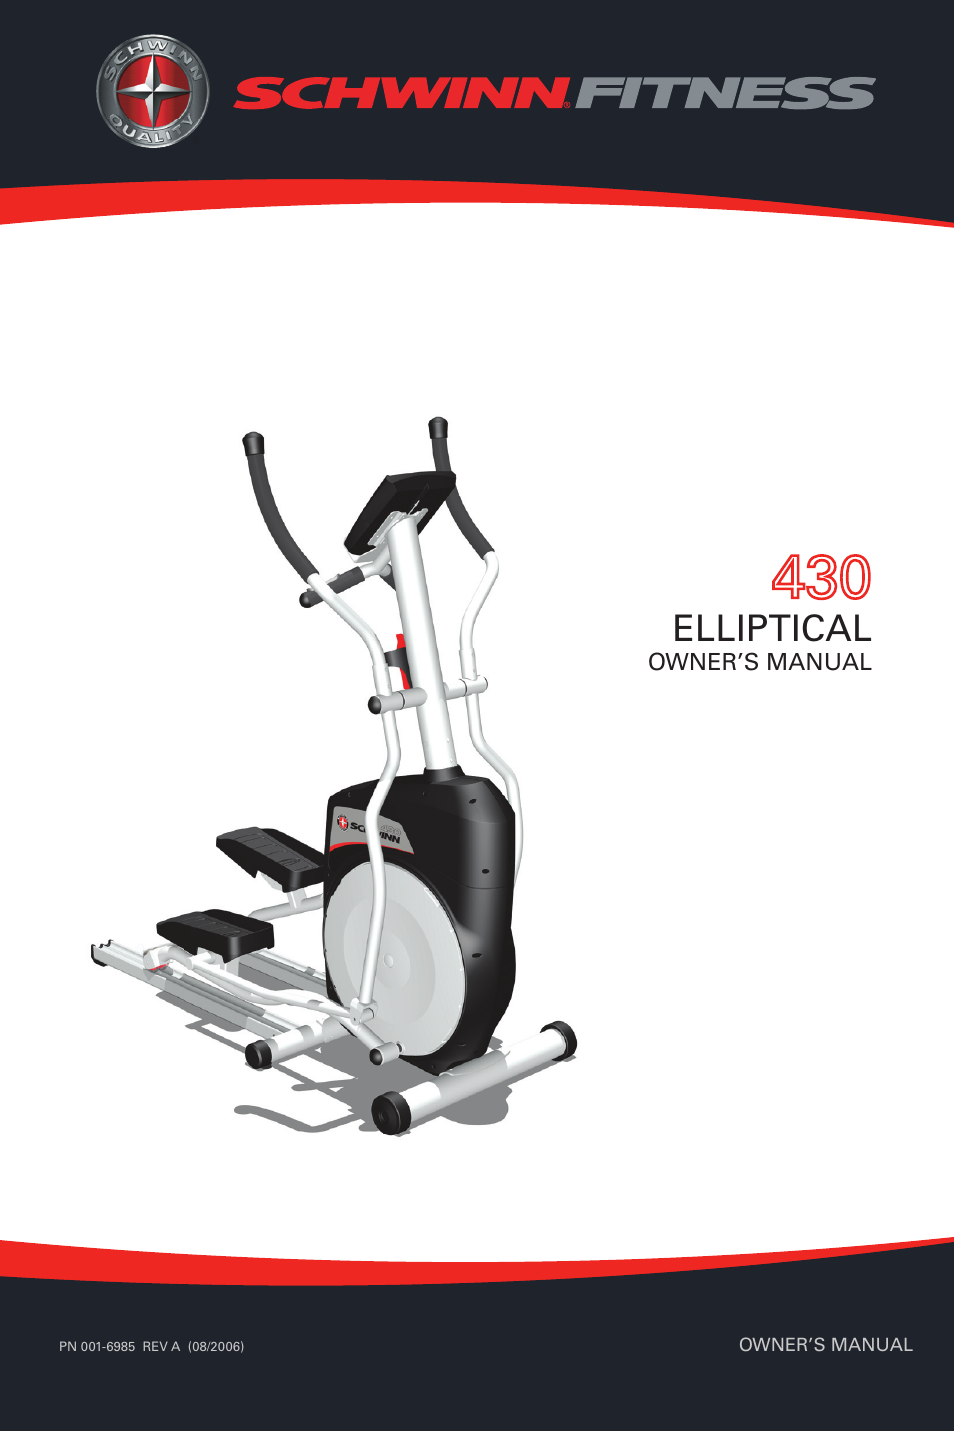 schwinn 430 user manual 36 pages rh manualsdir com schwinn 430 elliptical reviews schwinn 430 elliptical trainer review